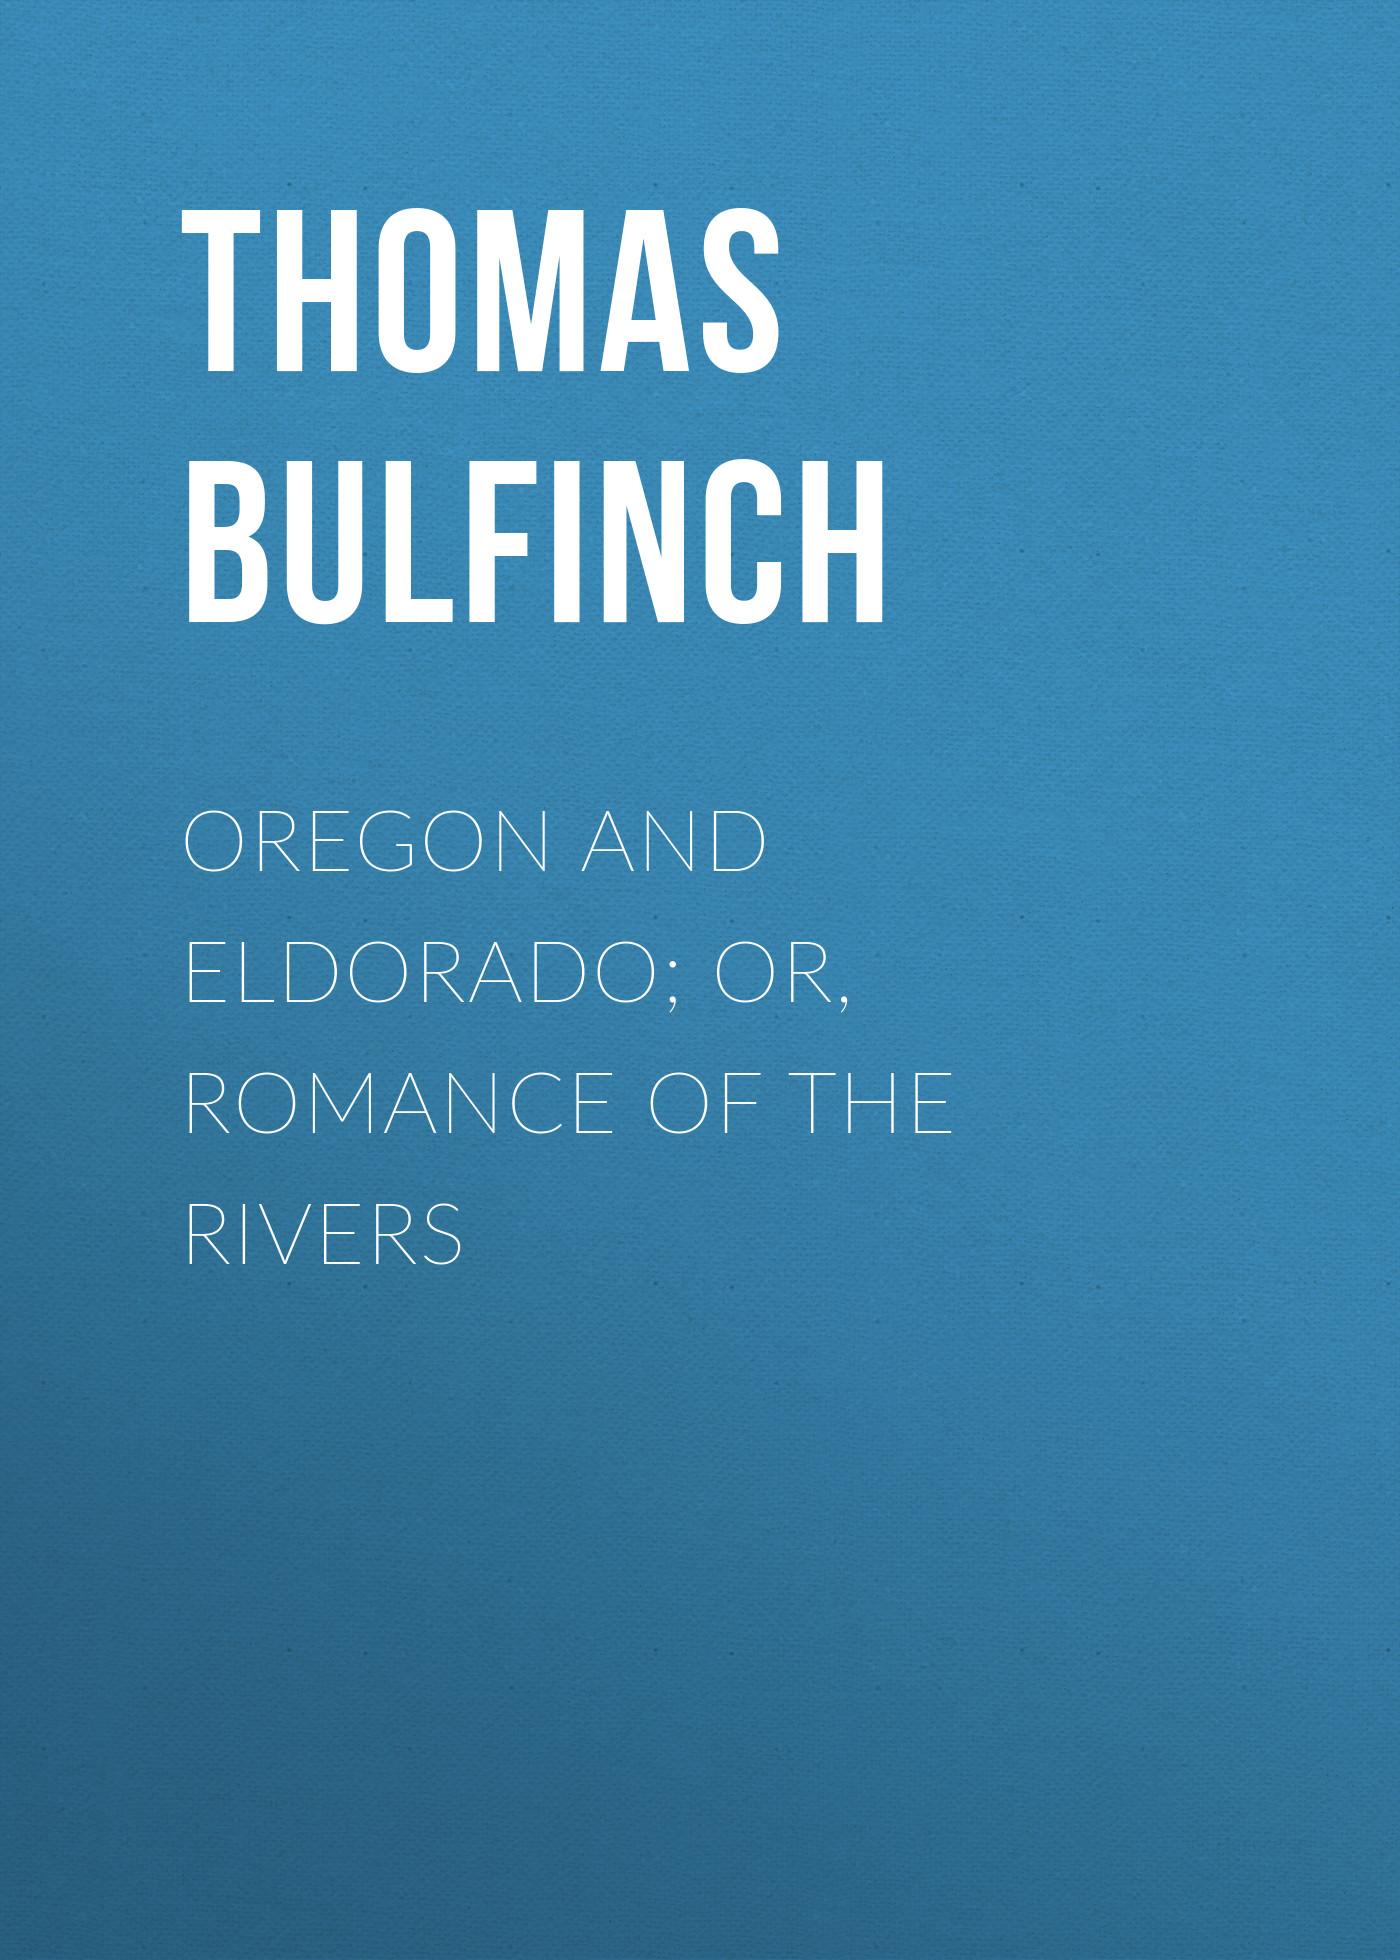 Bulfinch Thomas Oregon and Eldorado; or, Romance of the Rivers